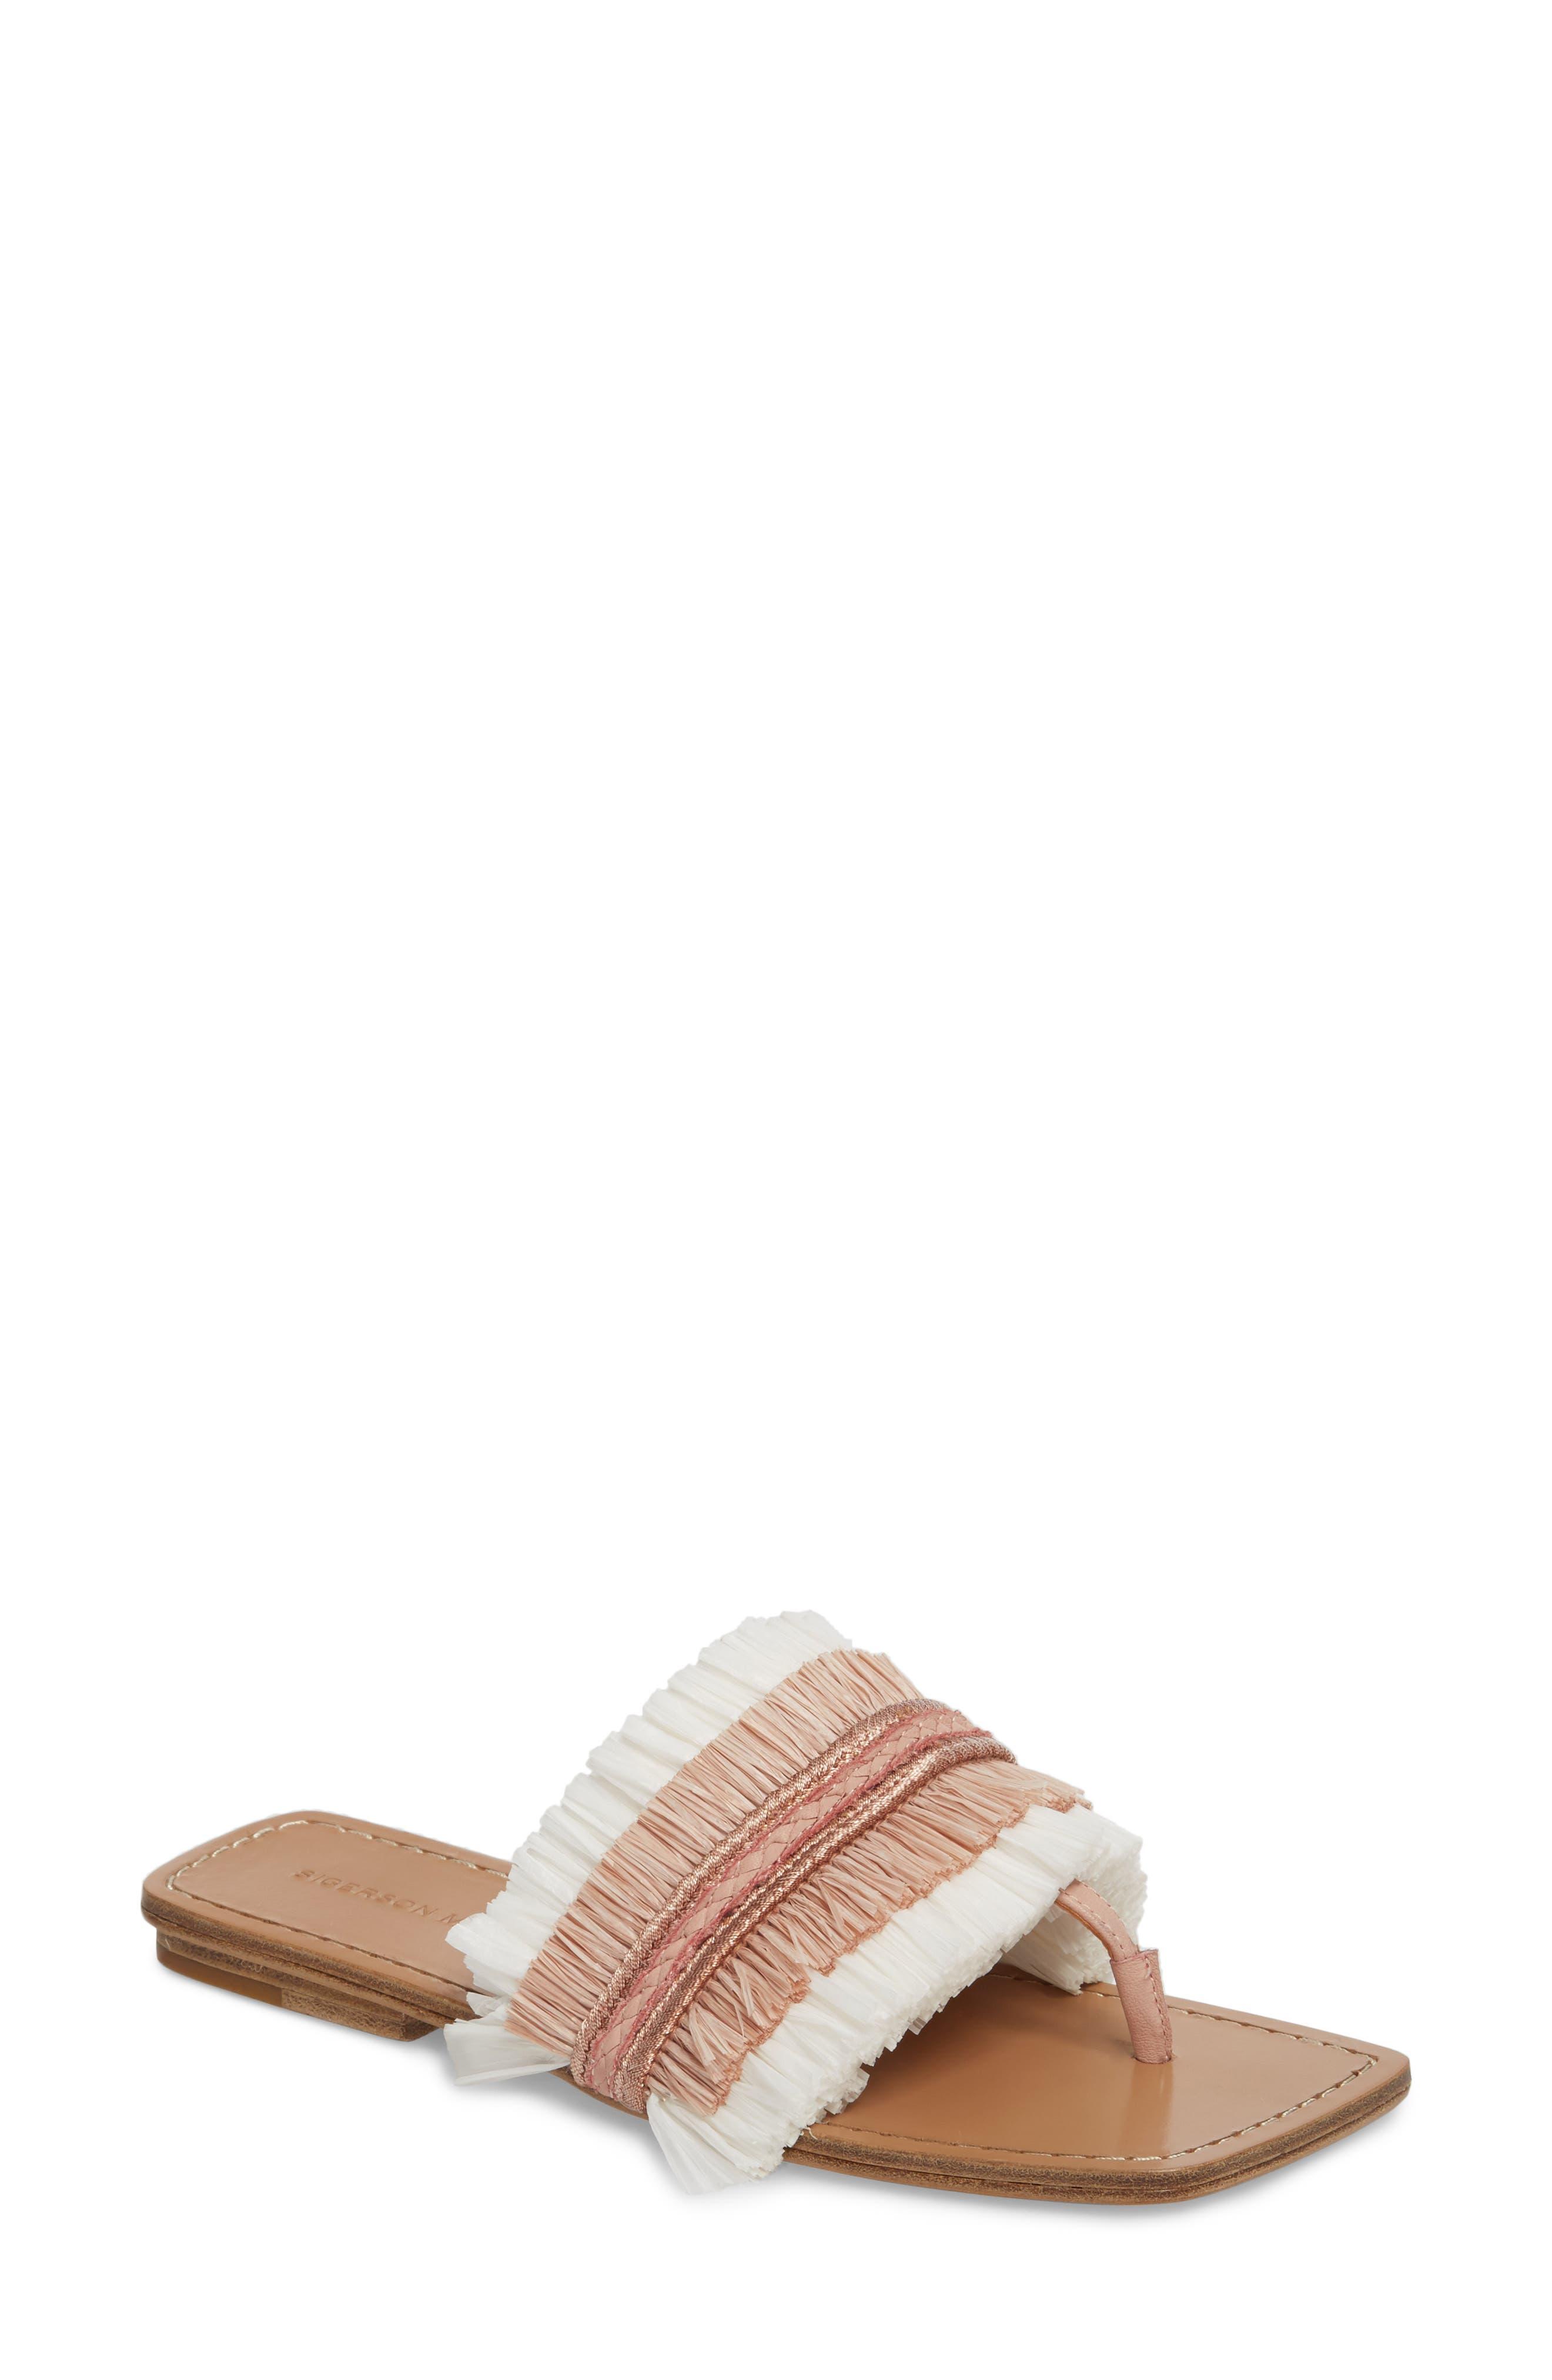 Woven Sandal,                         Main,                         color, 697